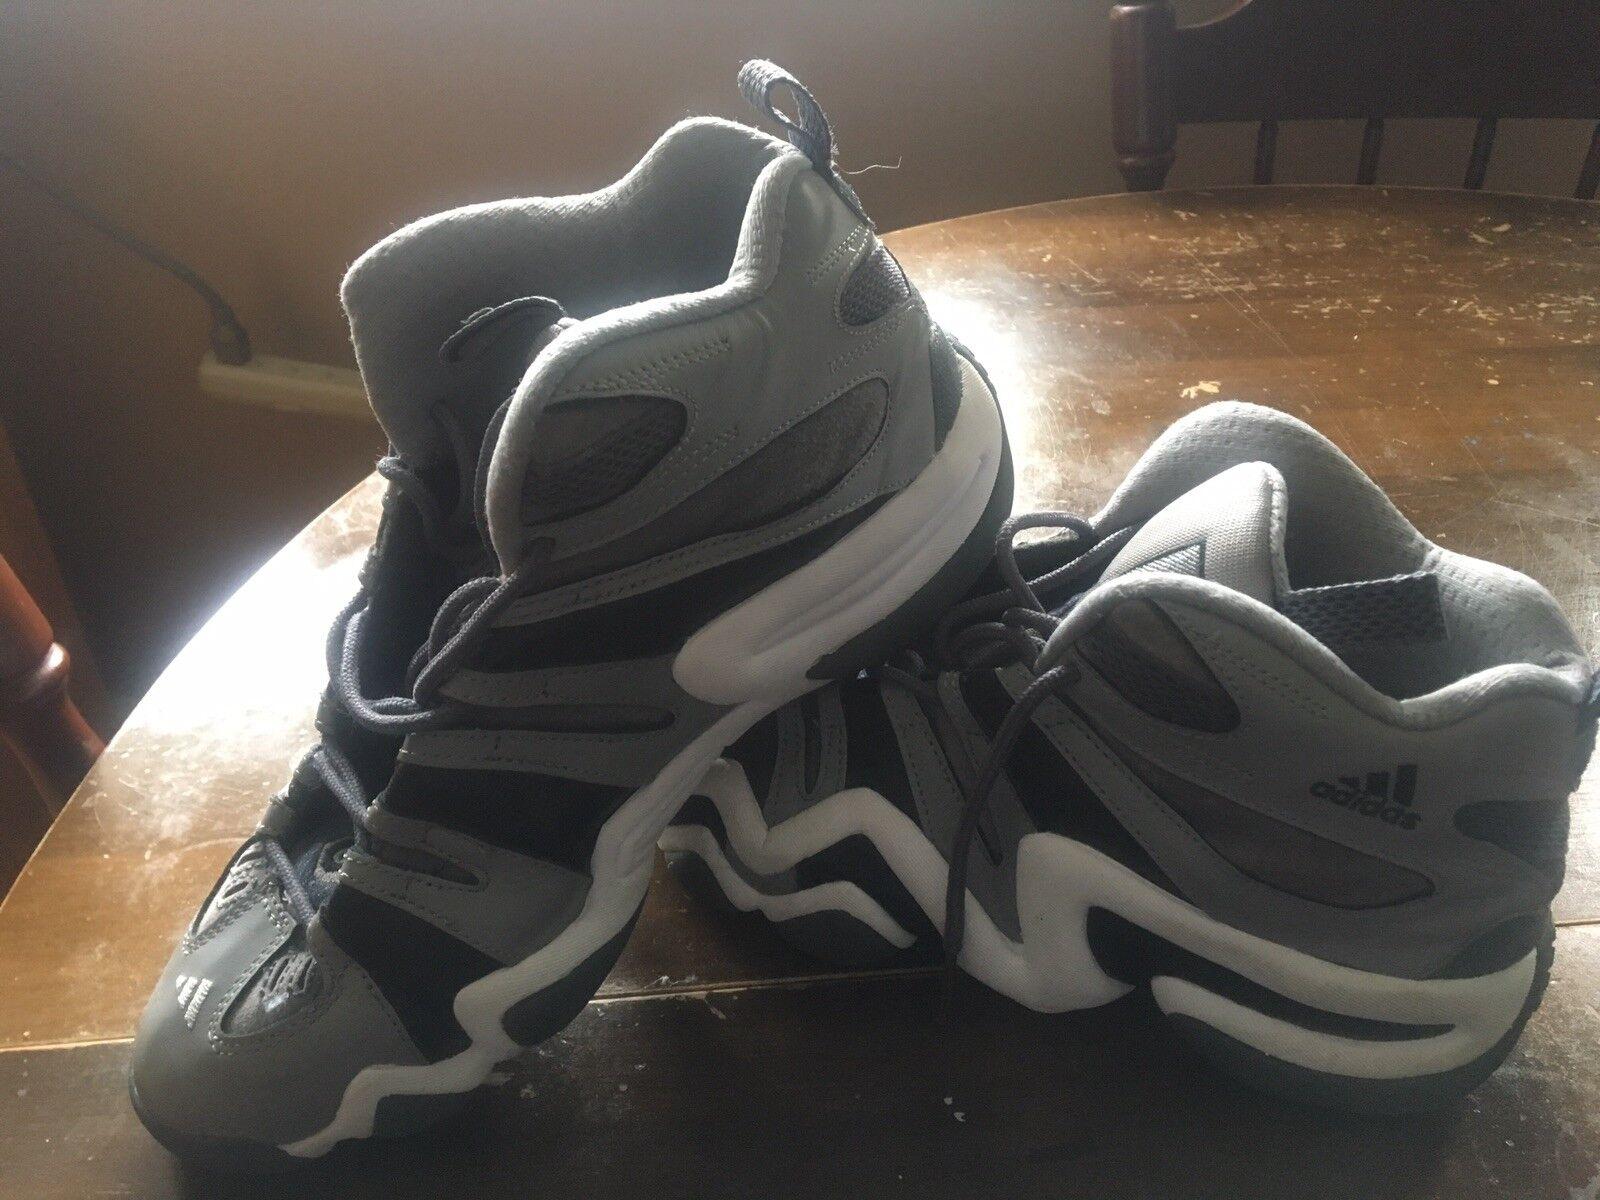 Original Kobe adidas crazy 8 size 10 (grey)